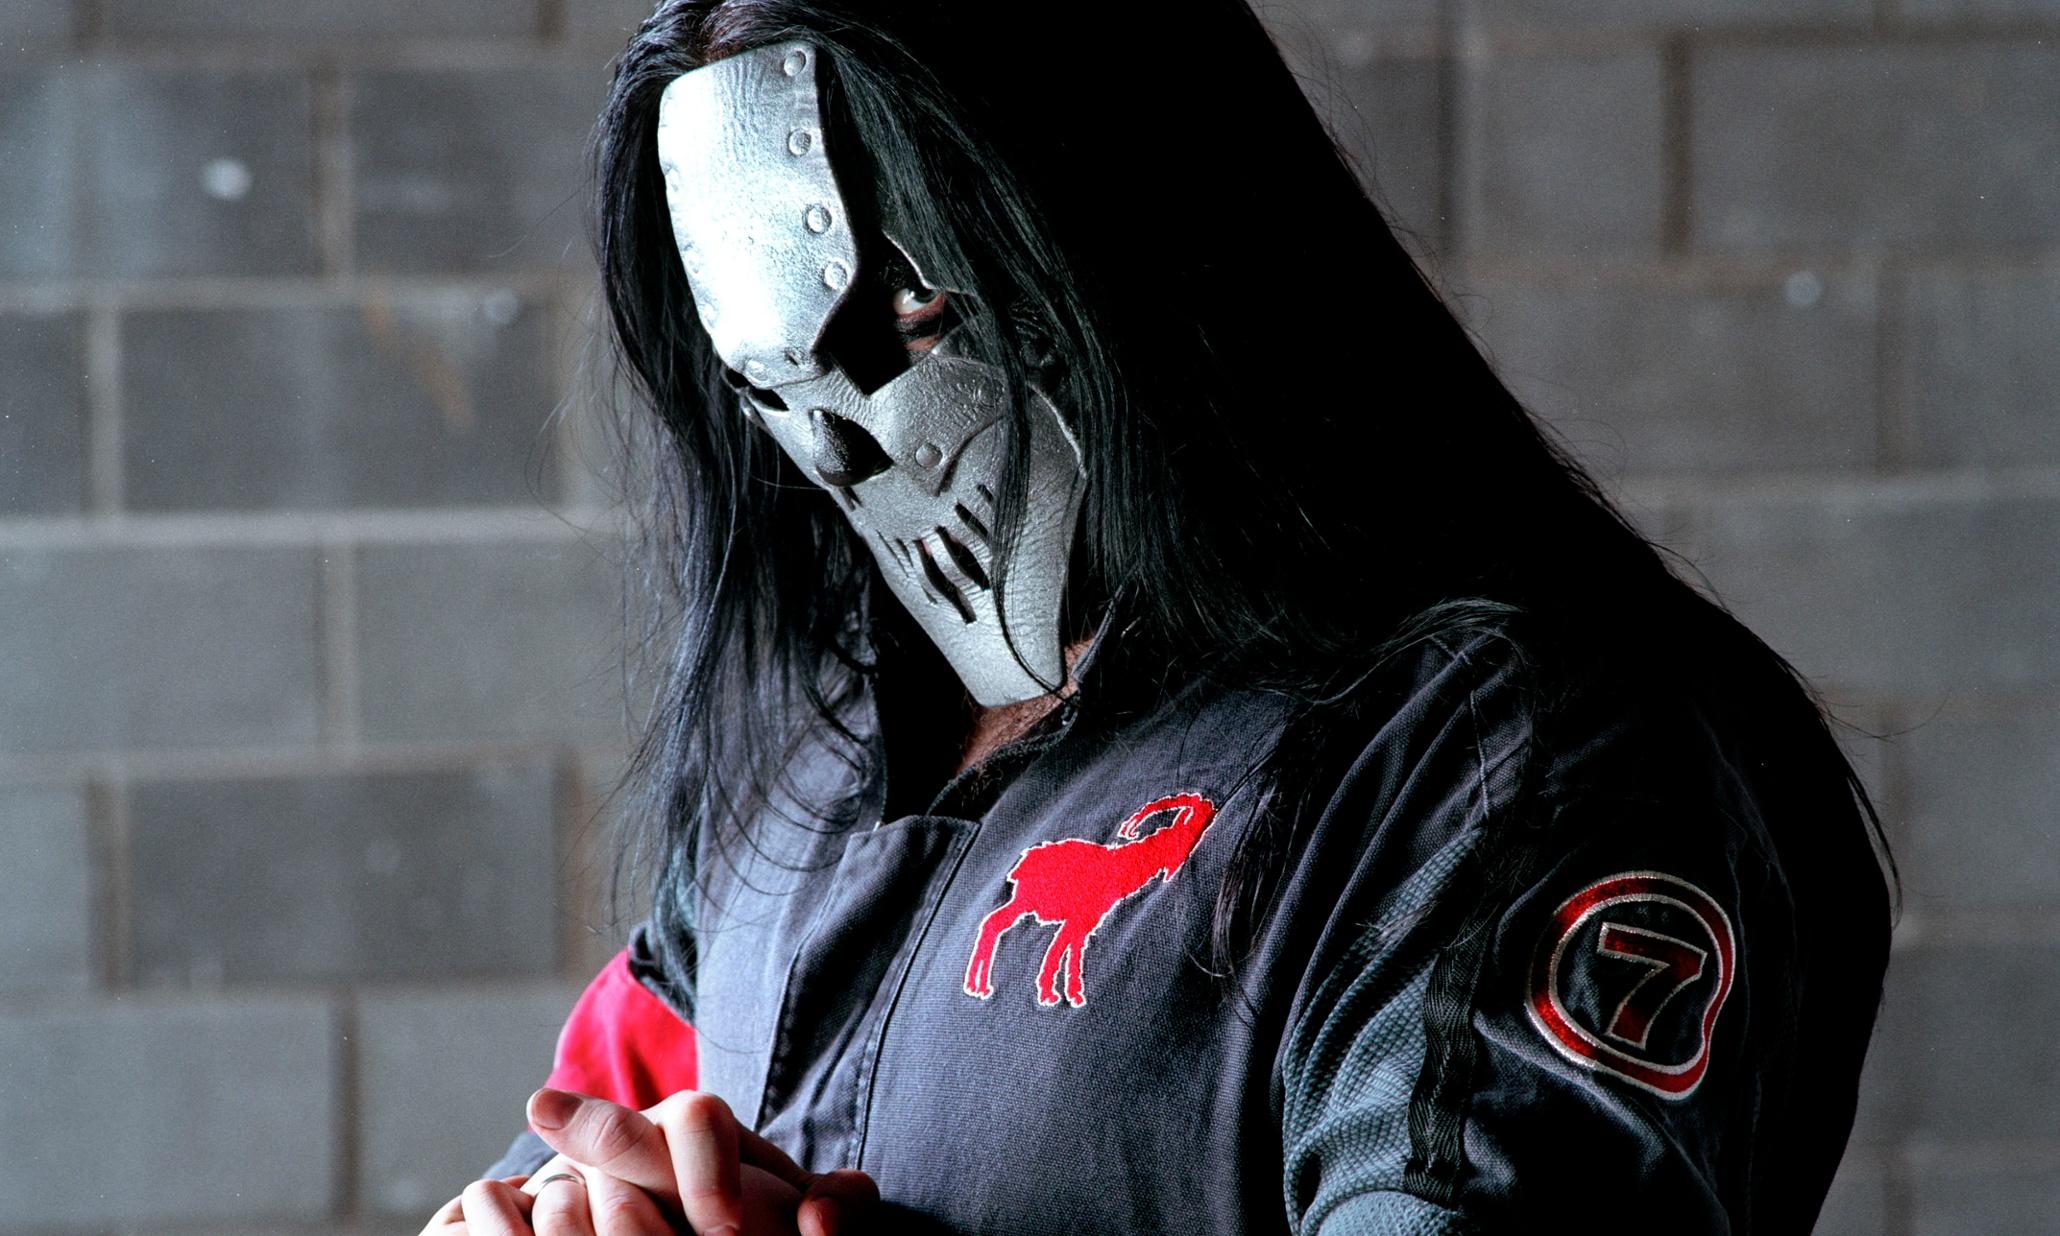 Slipknot guitarist Mick Thomson stabbed in head